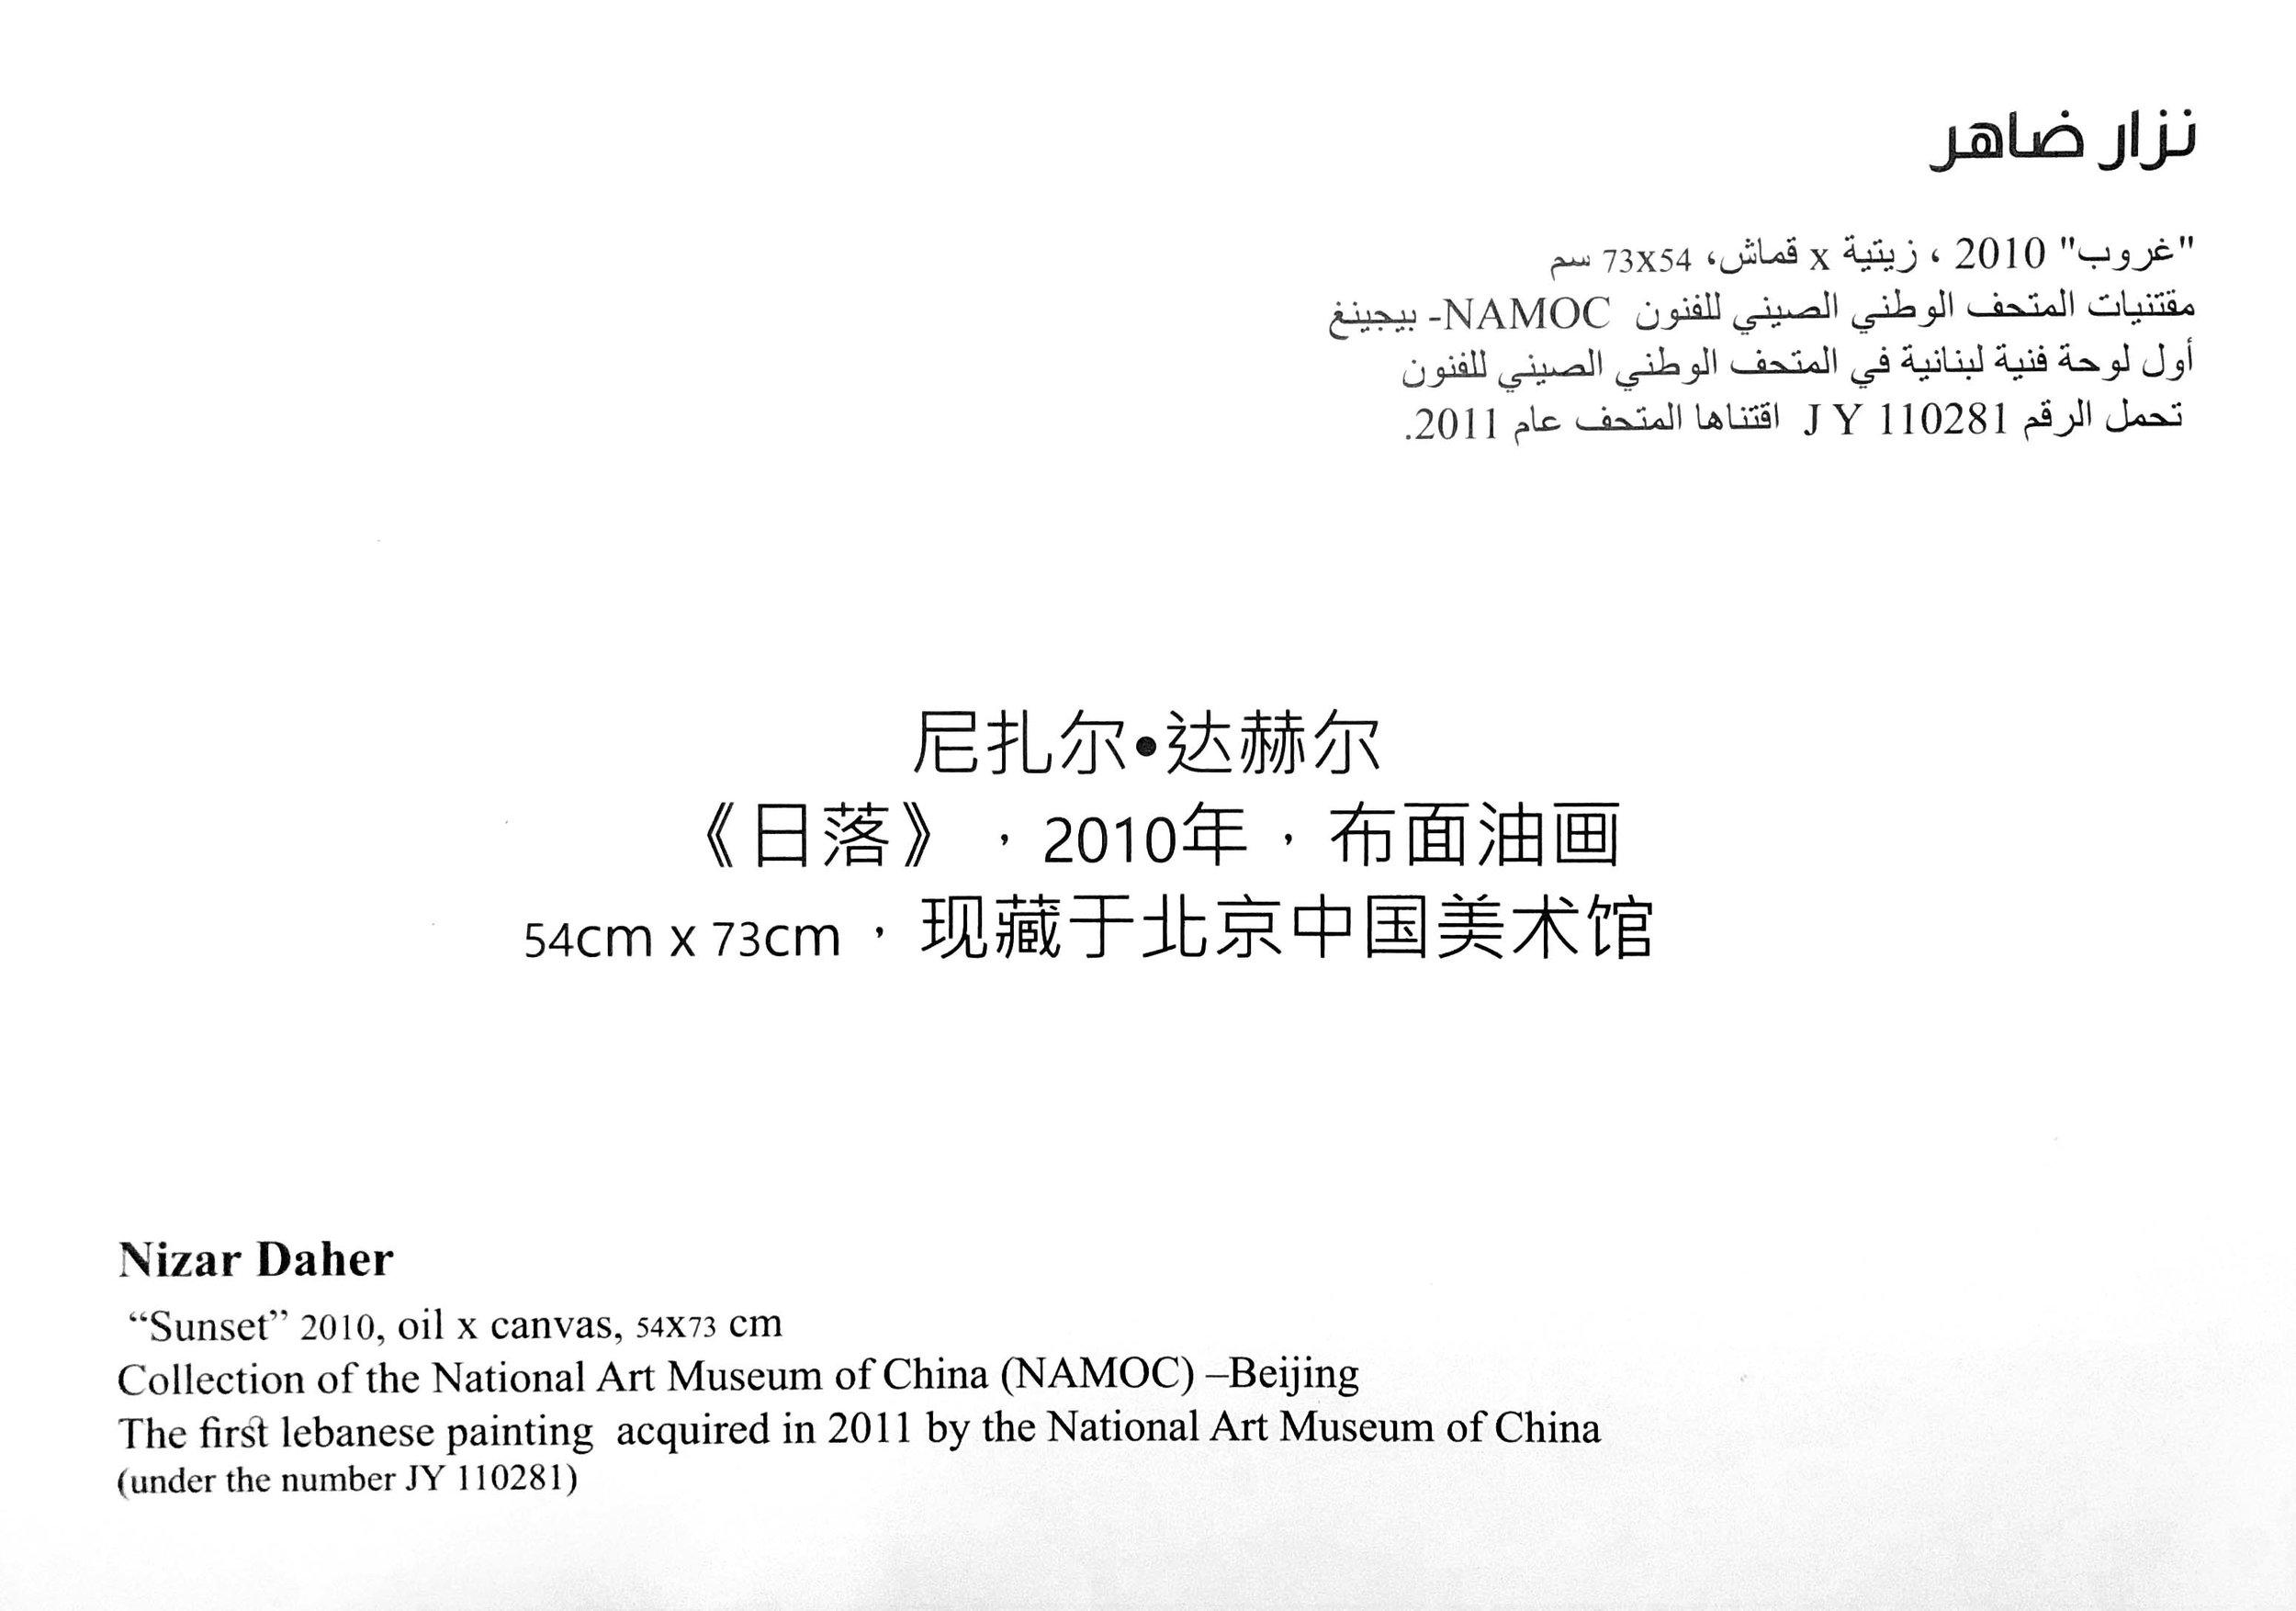 stamp2-2.jpg